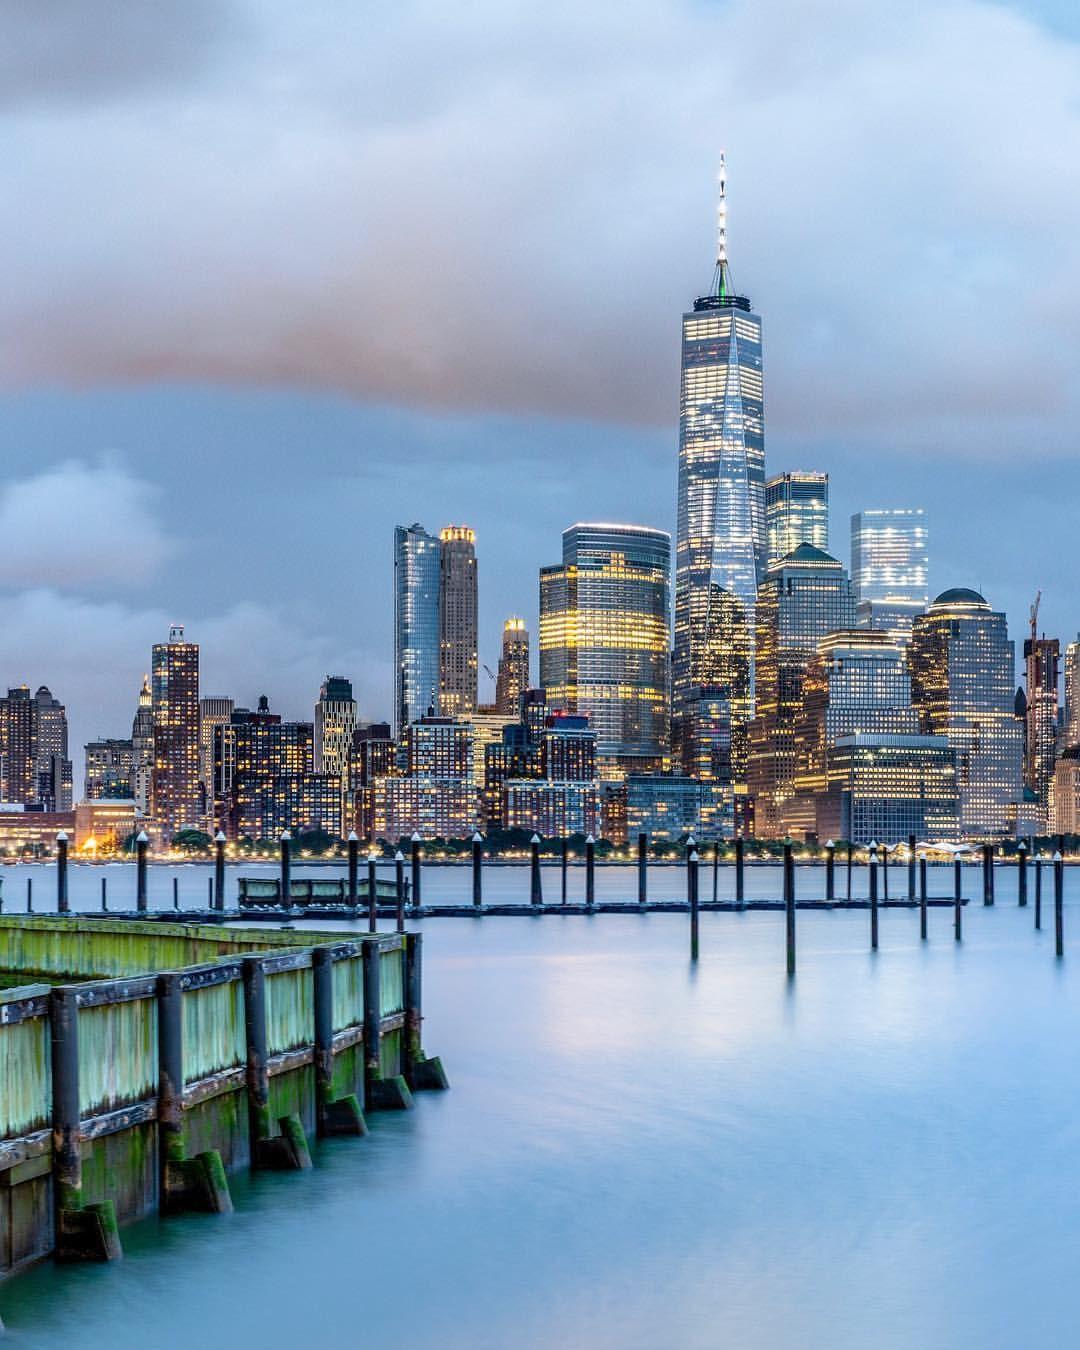 Newyork Newyorkcity Nyc Manhattan Oneworldtradecenter Newyorkphotography Photography Atlantic City Travel City Lifestyle Usa San Francisco